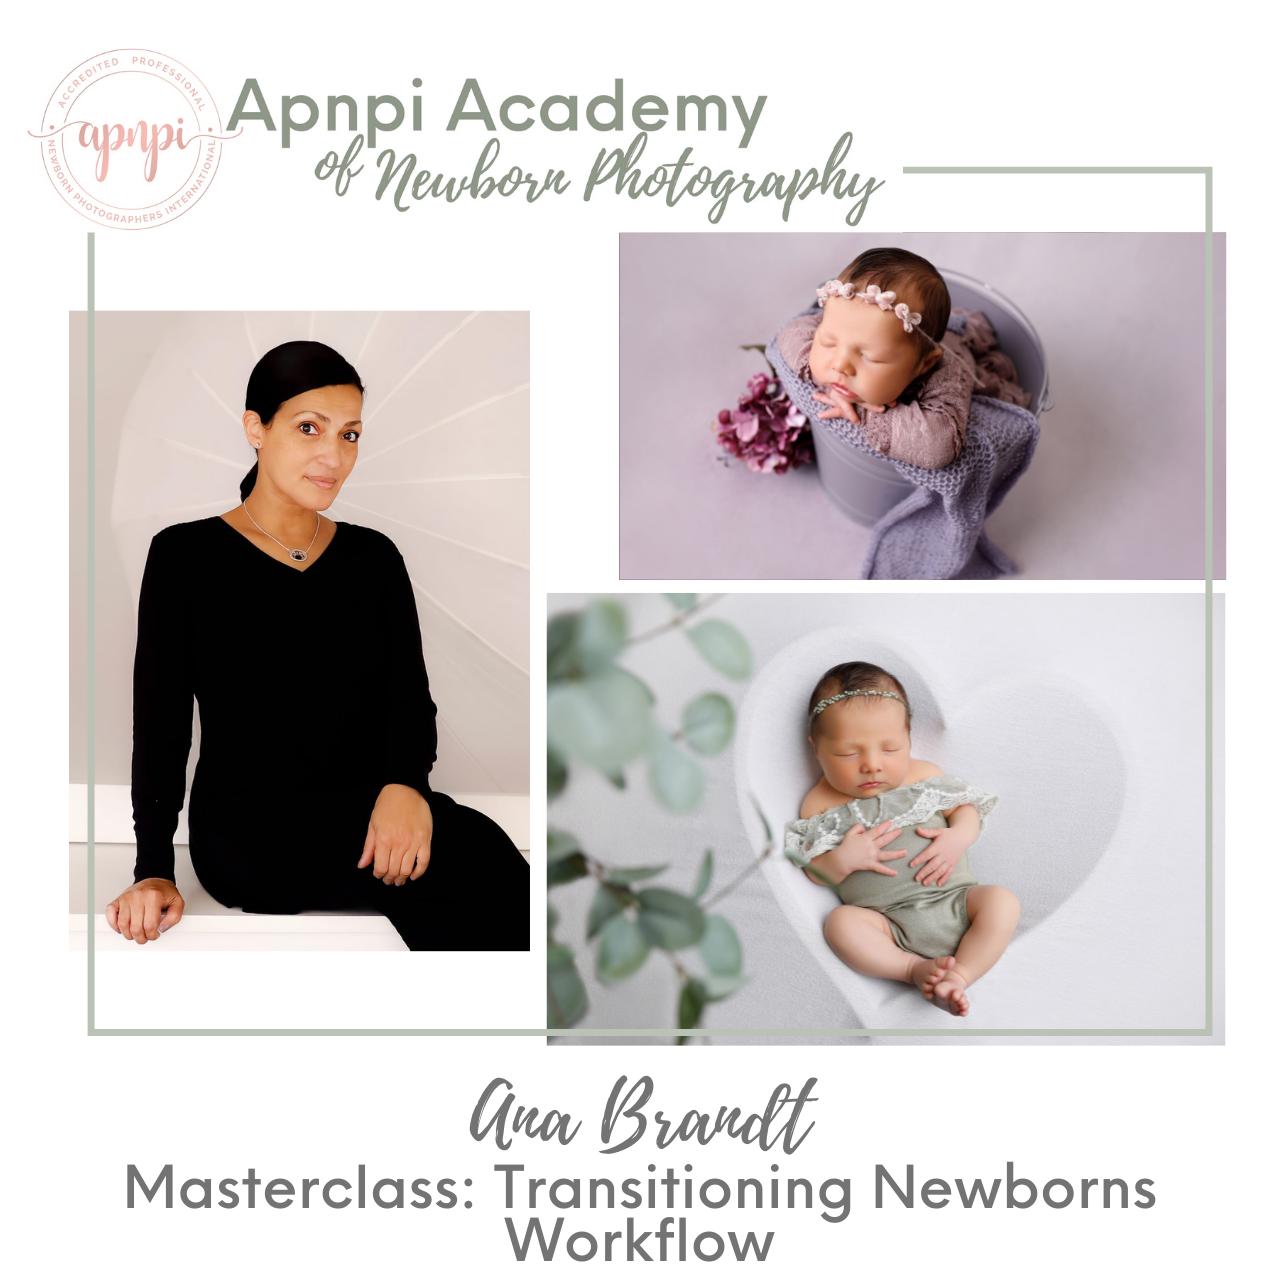 Ana Brandt Newborn Transitions Workflow APNPI Academy Course